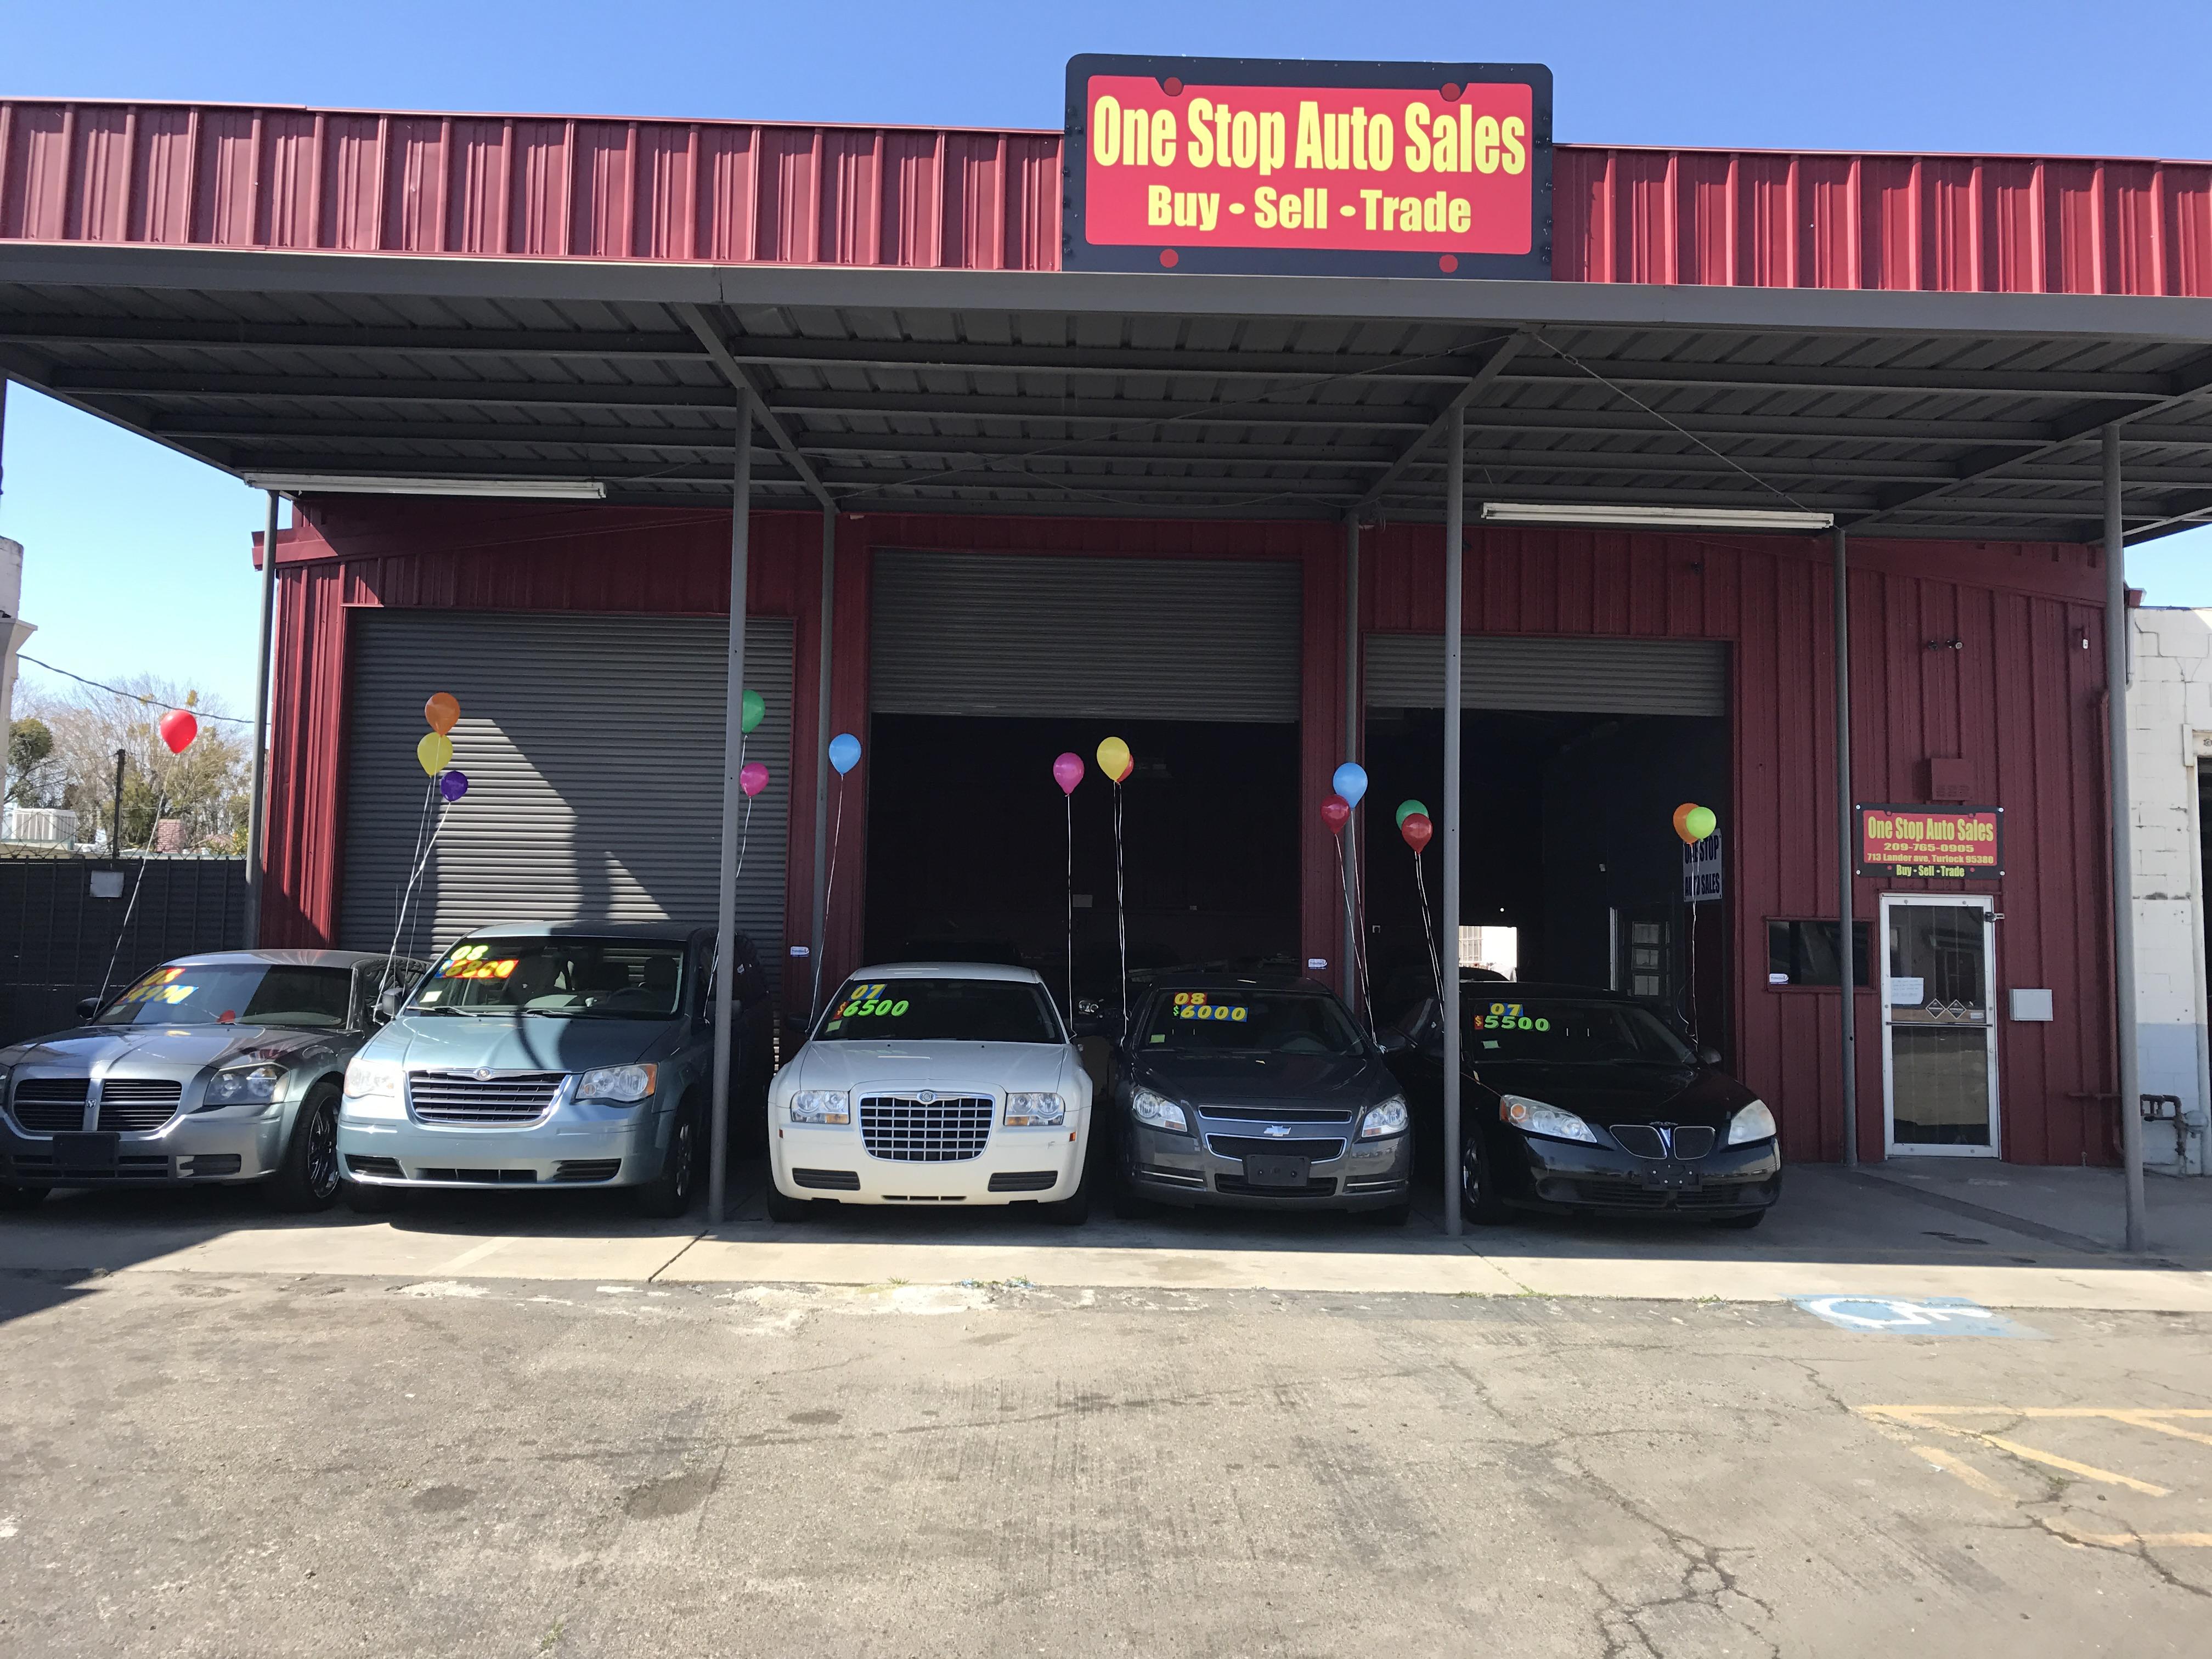 One Stop Automotive >> One Stop Auto Sales 713 Lander Ave Turlock Ca 95380 Yp Com